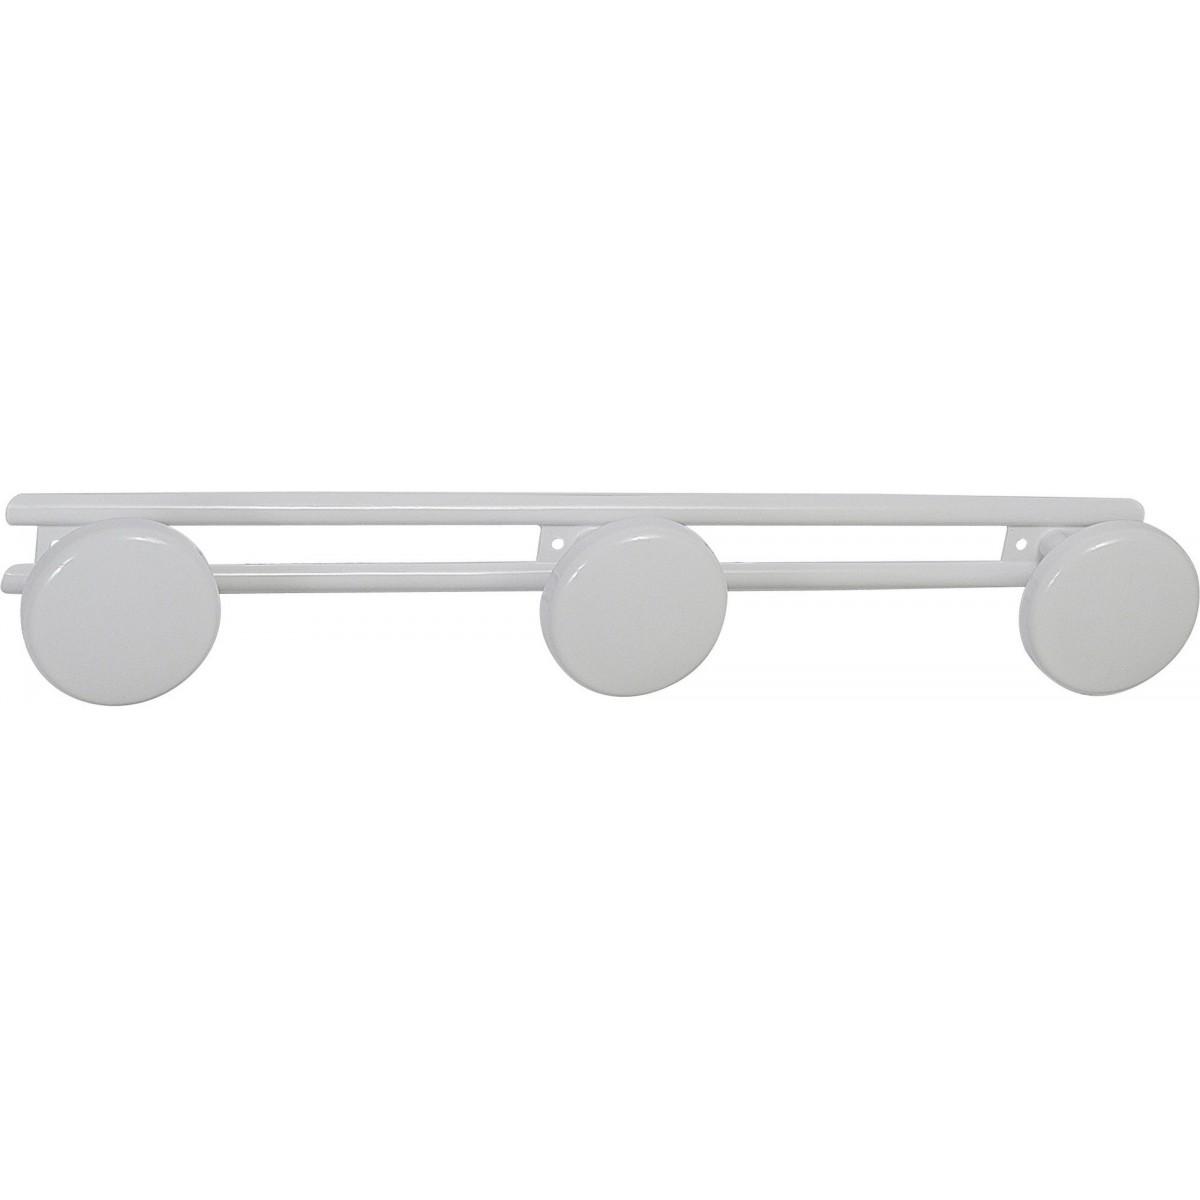 Porte-peignoir époxy blanc - 3 Têtes - Godonnier